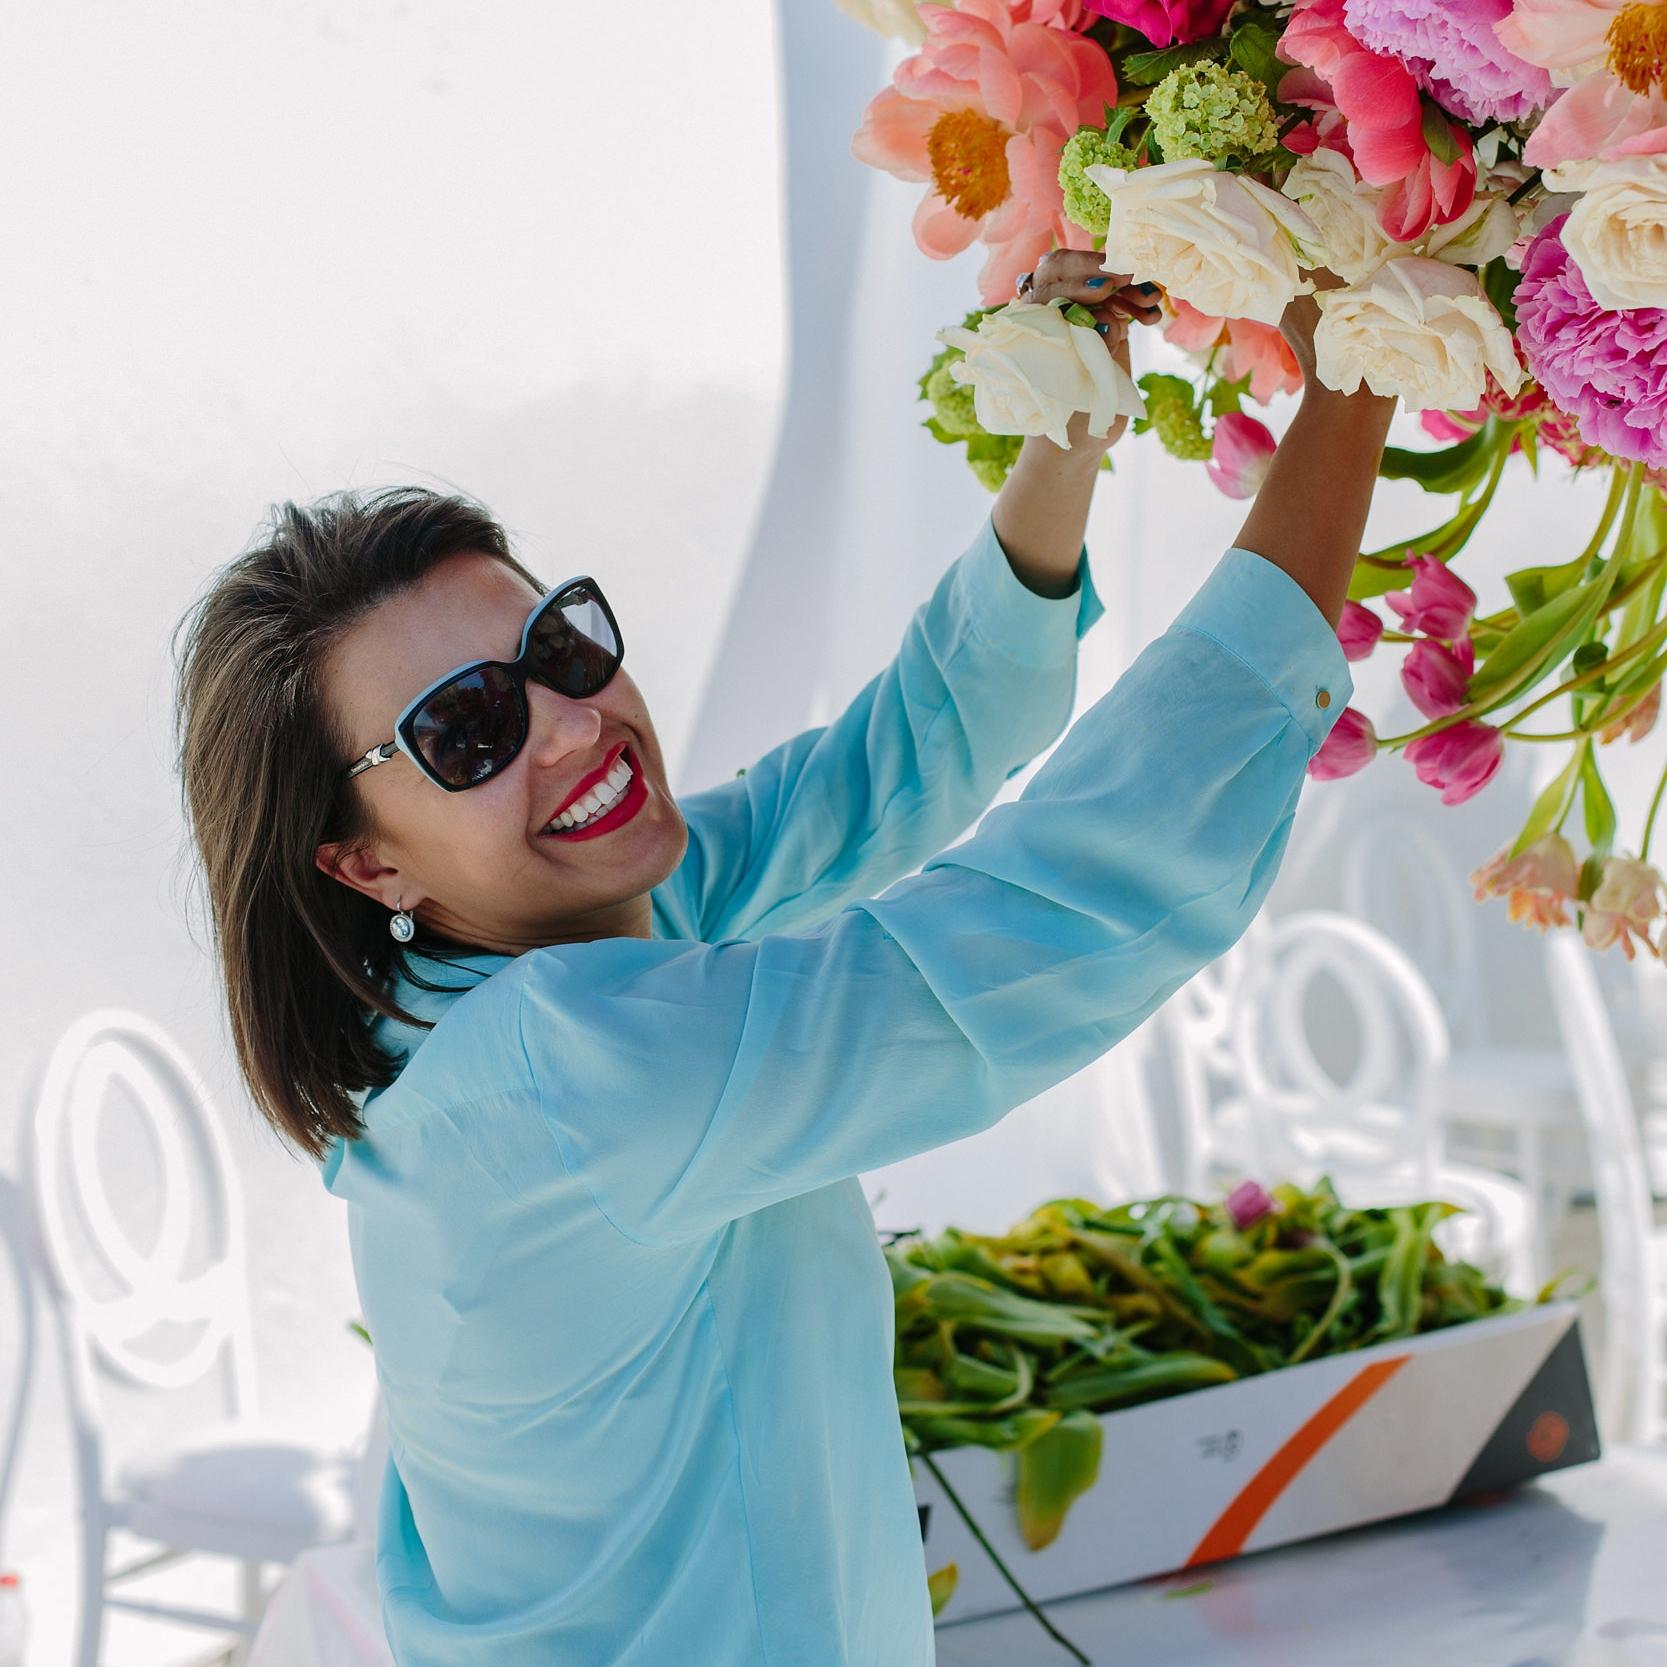 nadia_duran_destination_weddings_event_planning.JPG